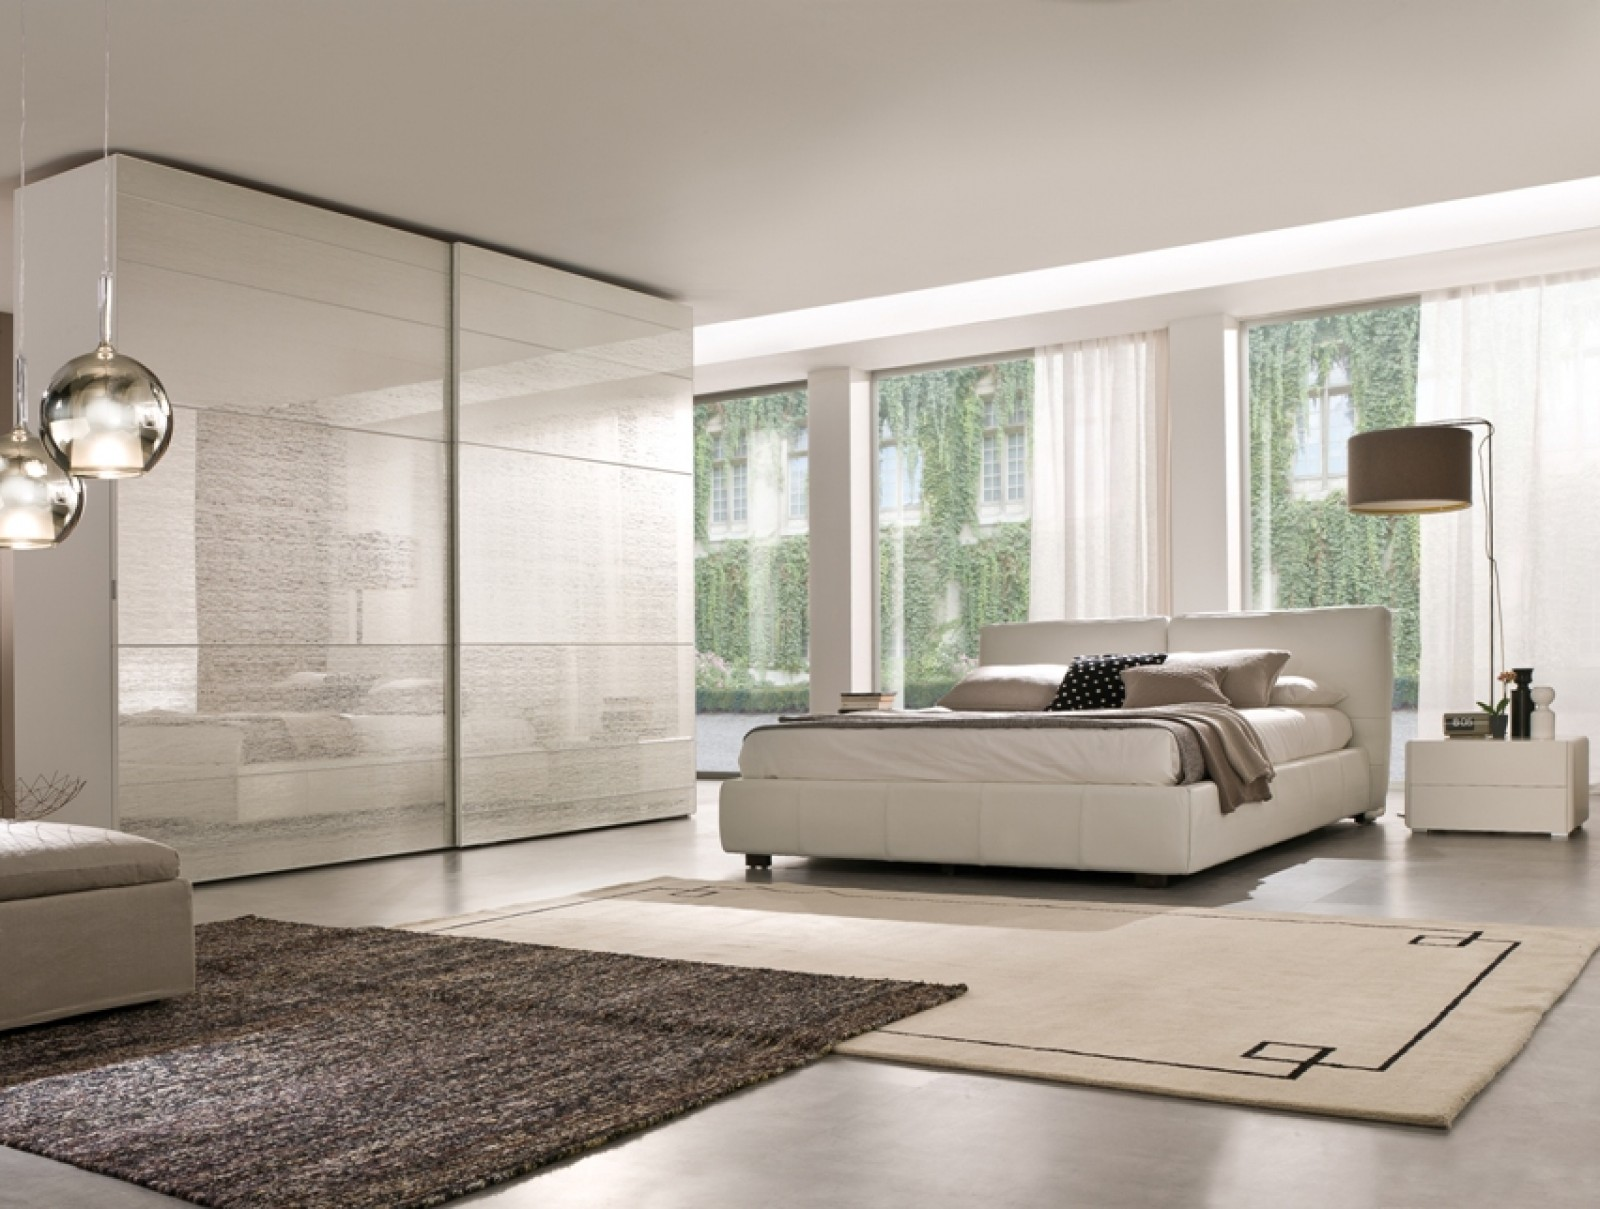 Proposte d 39 arredo zona notte camera moderna di for Mb arredamenti camere da letto